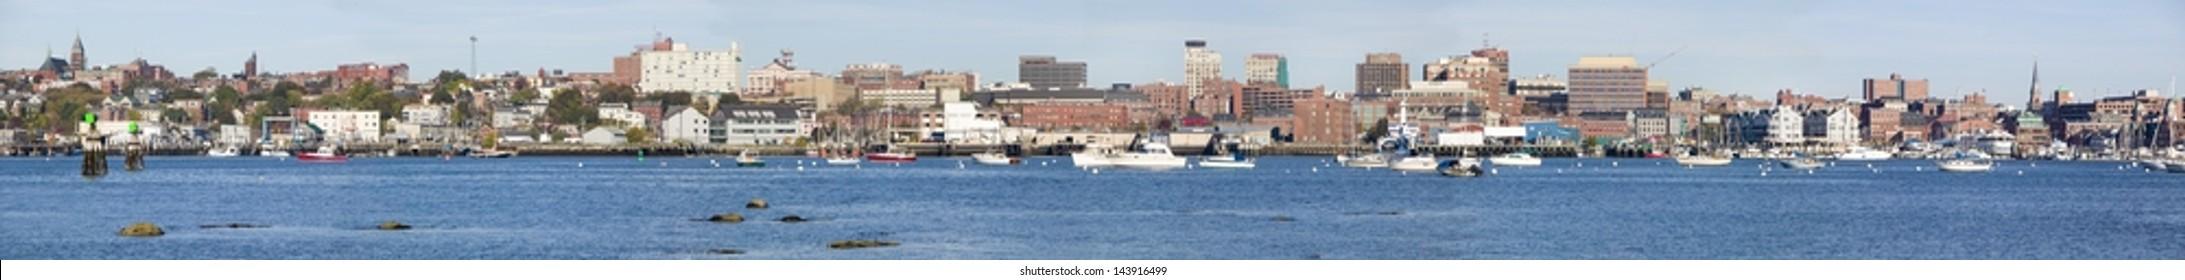 Panoramic view of Portland Harbor boats with south Portland skyline, Portland, Maine